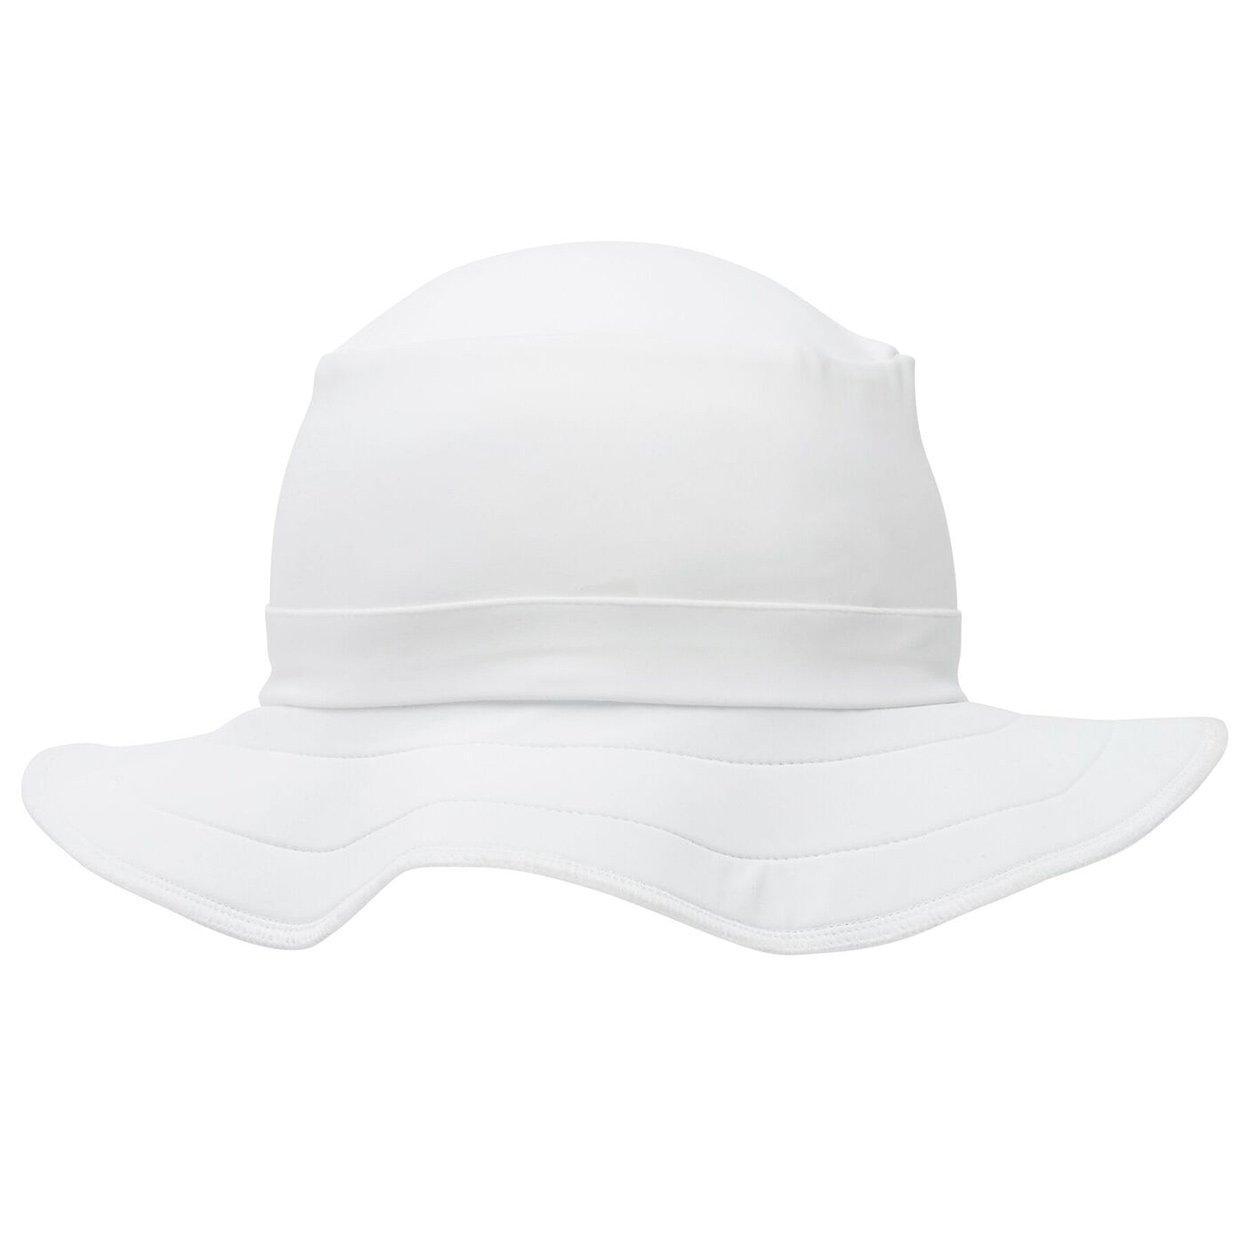 d12e5211f2f40 Kids Funky Bucket Hat Upf 50 By Swimlids White Small 2 10 Unisex Sunpoplife